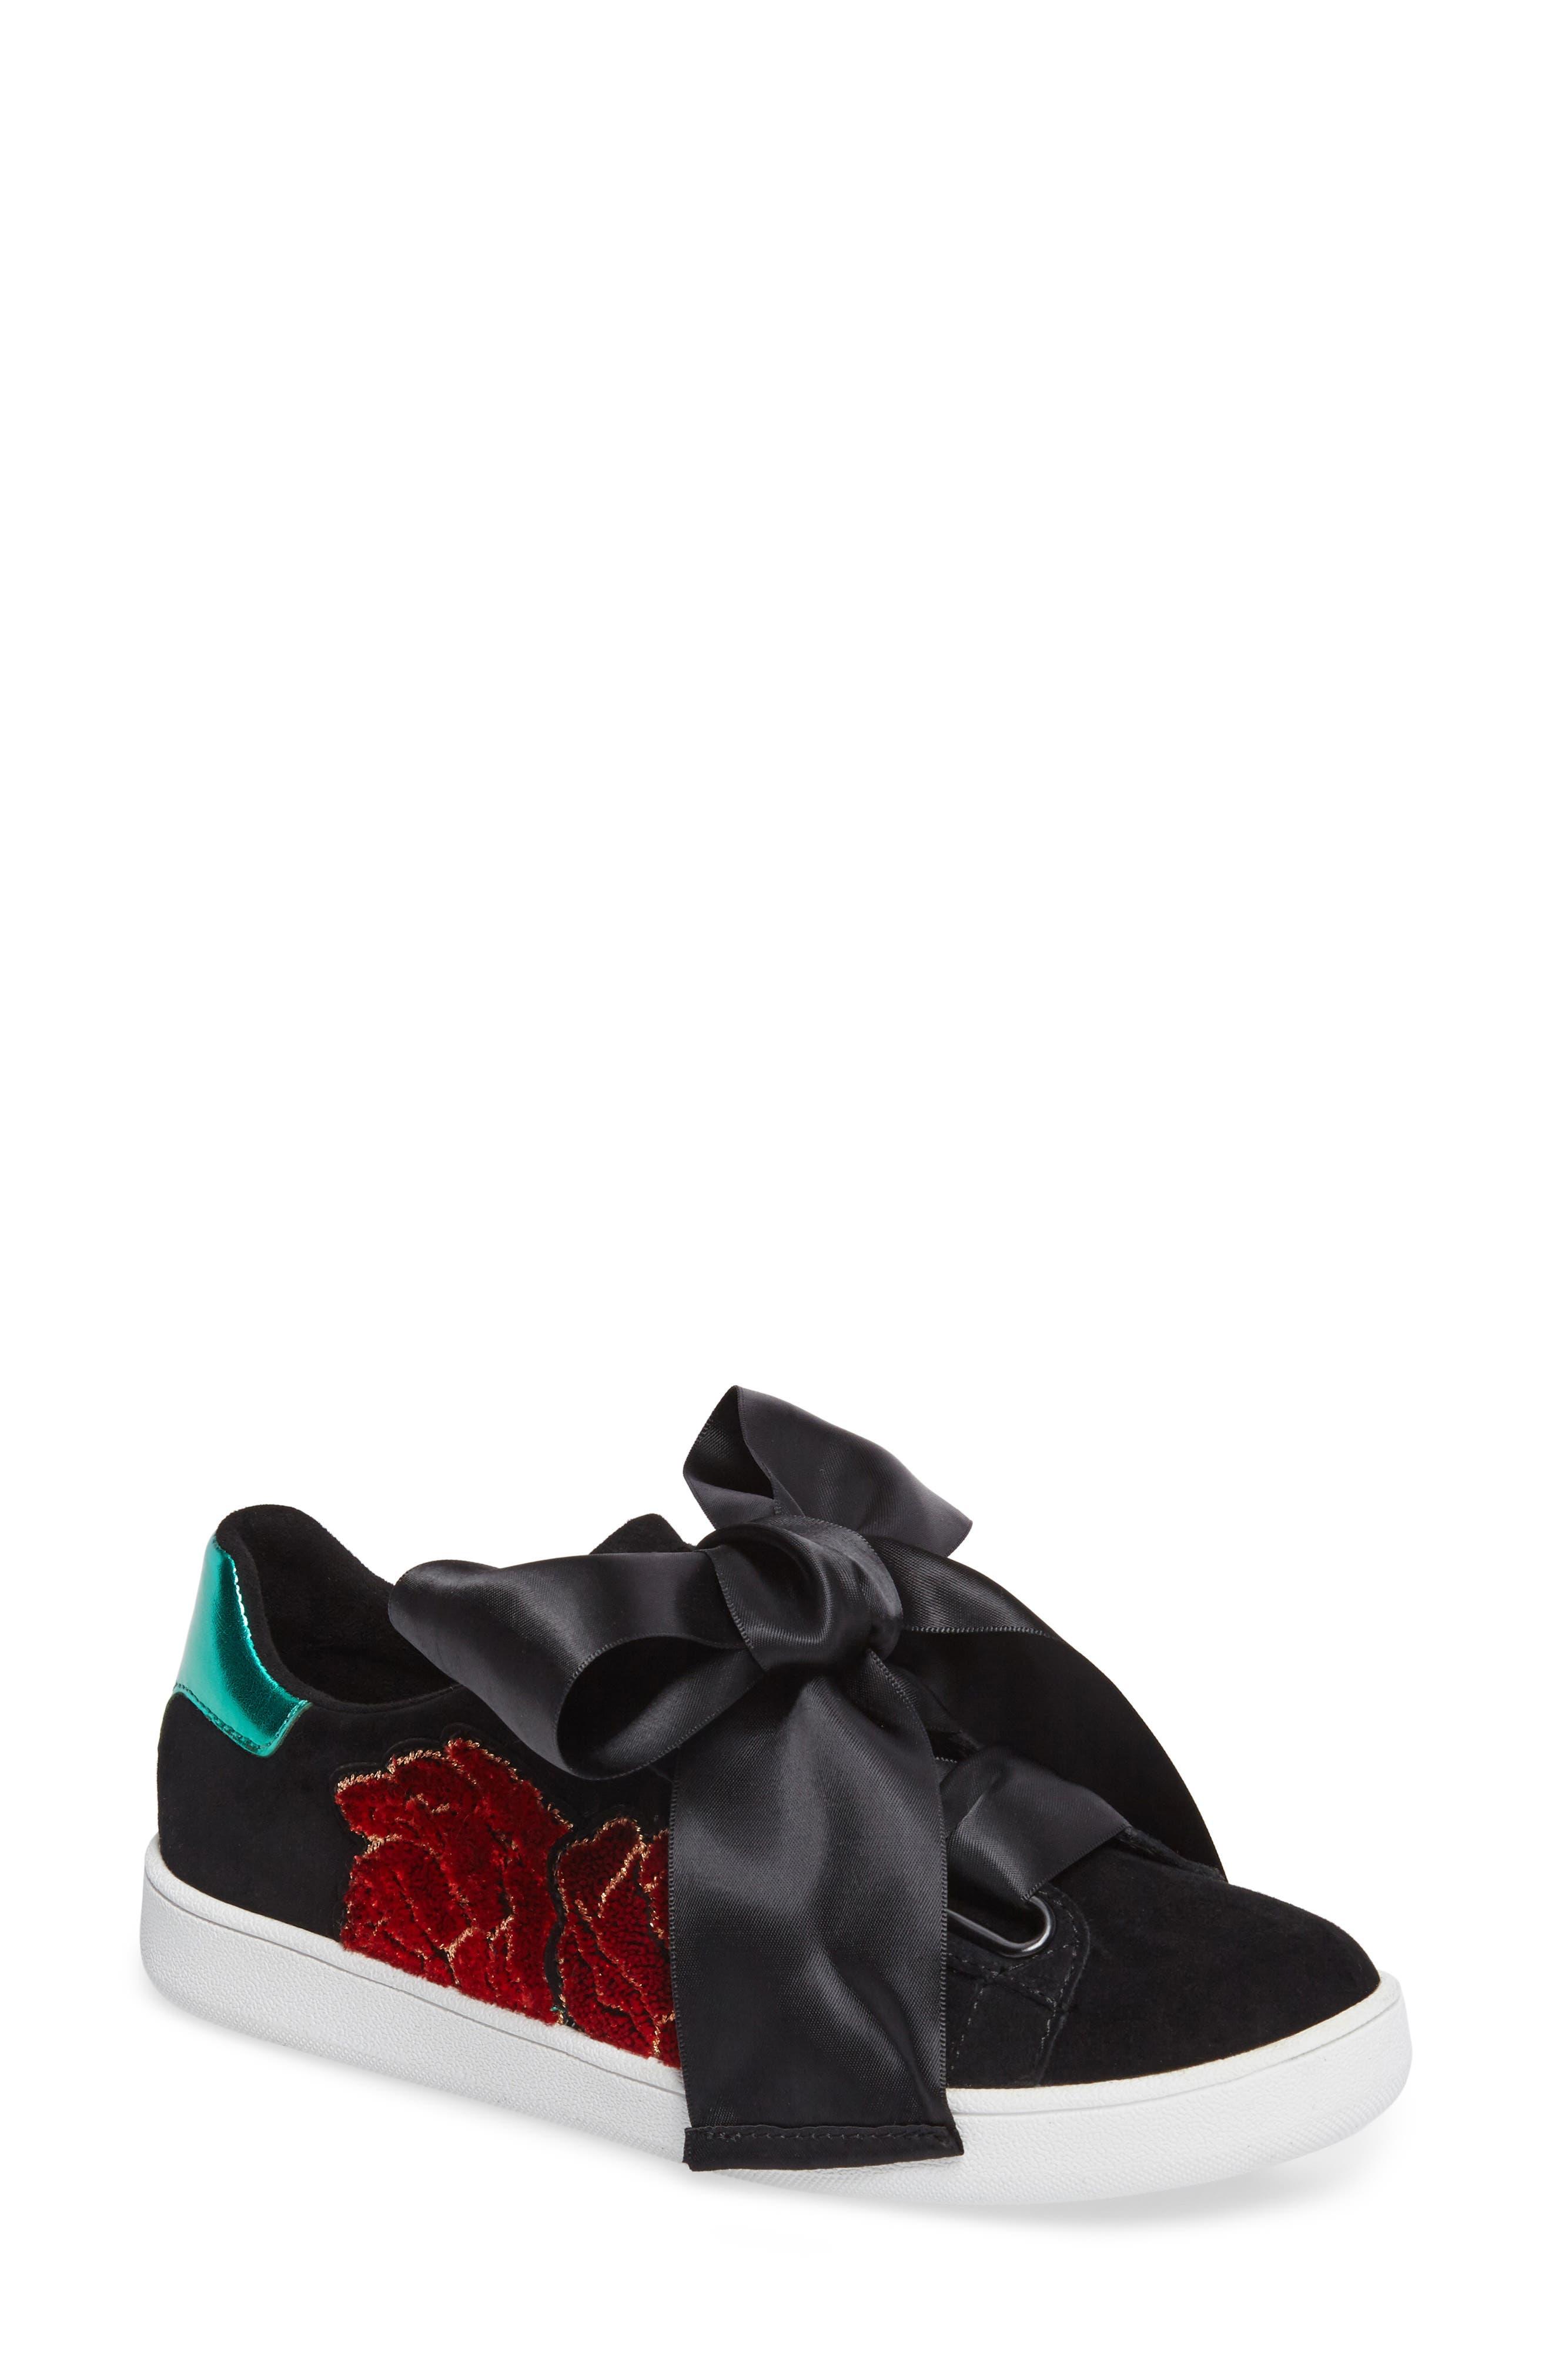 Pabst Low-Top Sneaker,                         Main,                         color, 001